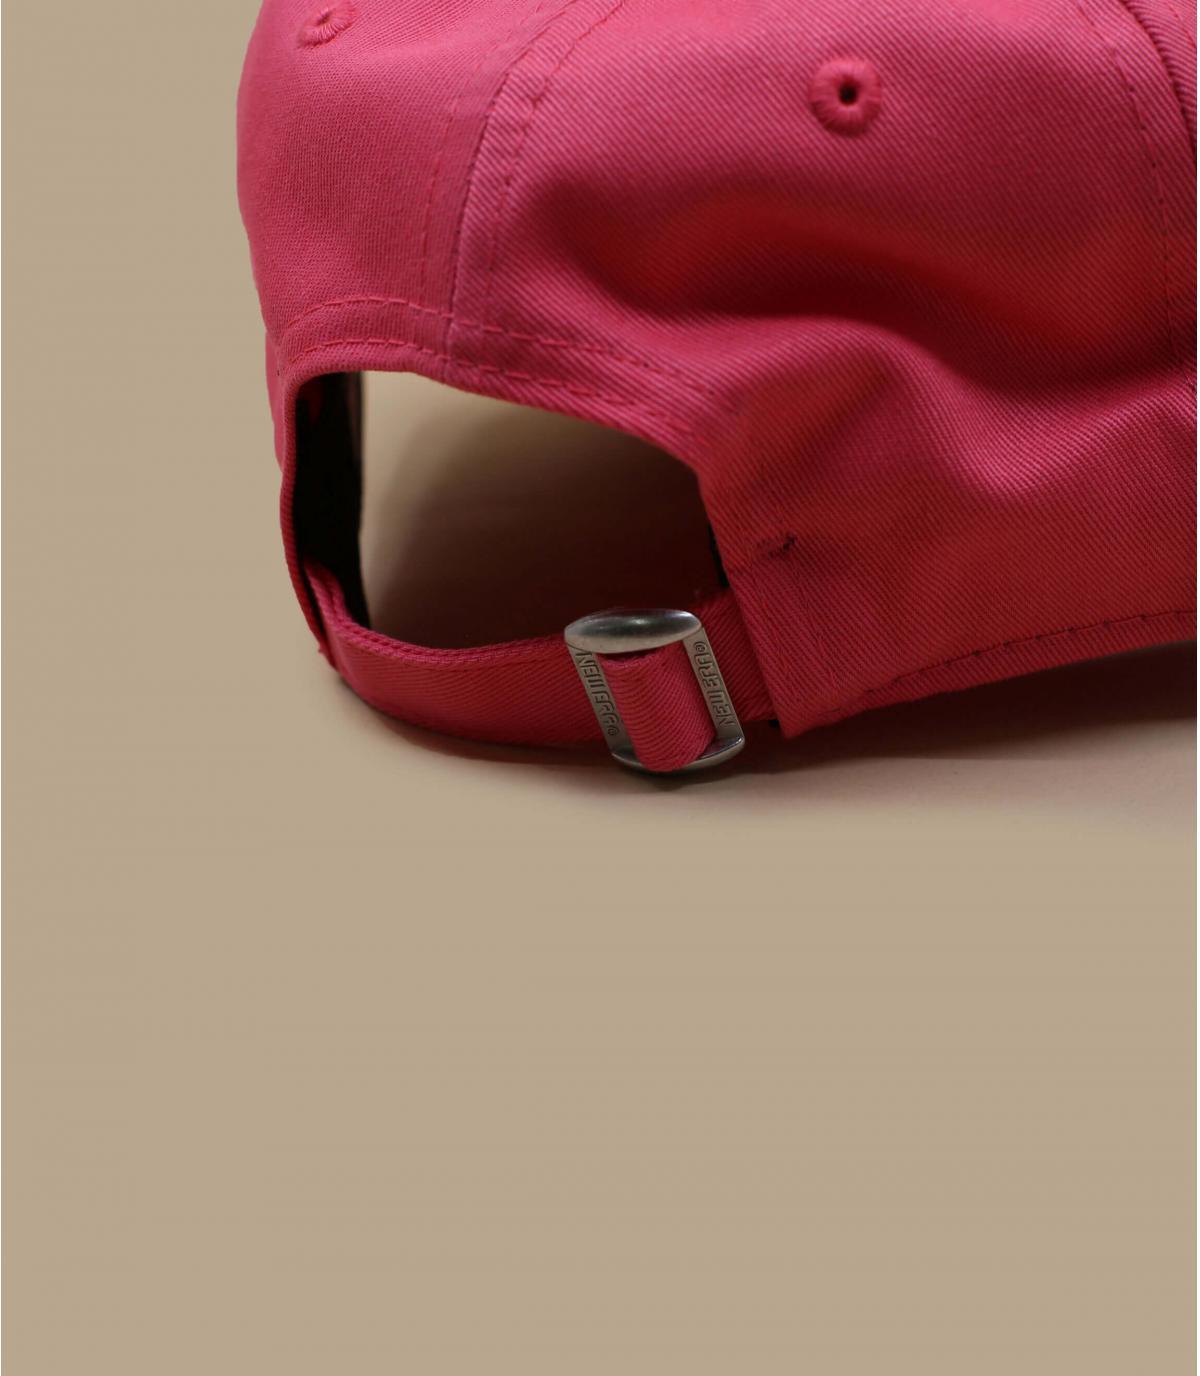 Details Wmn Camo Infill NY 940 pink - Abbildung 4